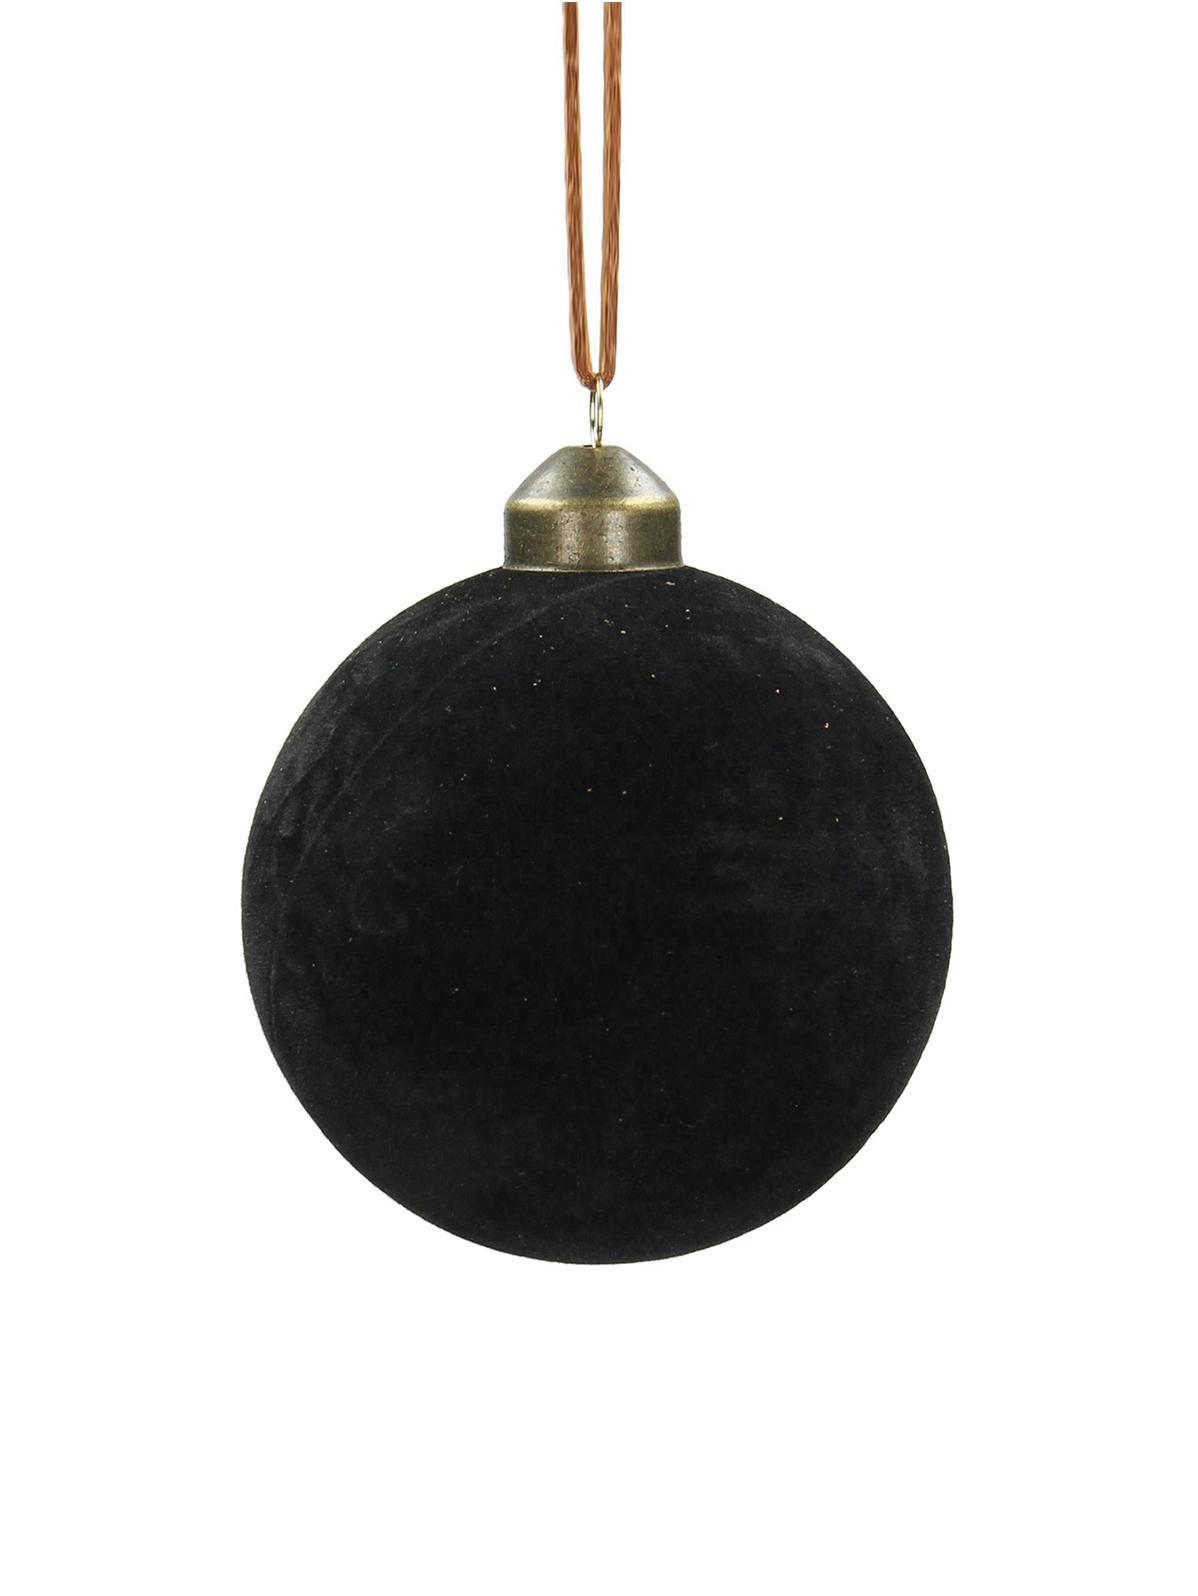 Bolas de Navidad Velvet, Ø8cm, 4uds., Vidrio, terciopelo de poliéster, Negro, Ø 8 cm